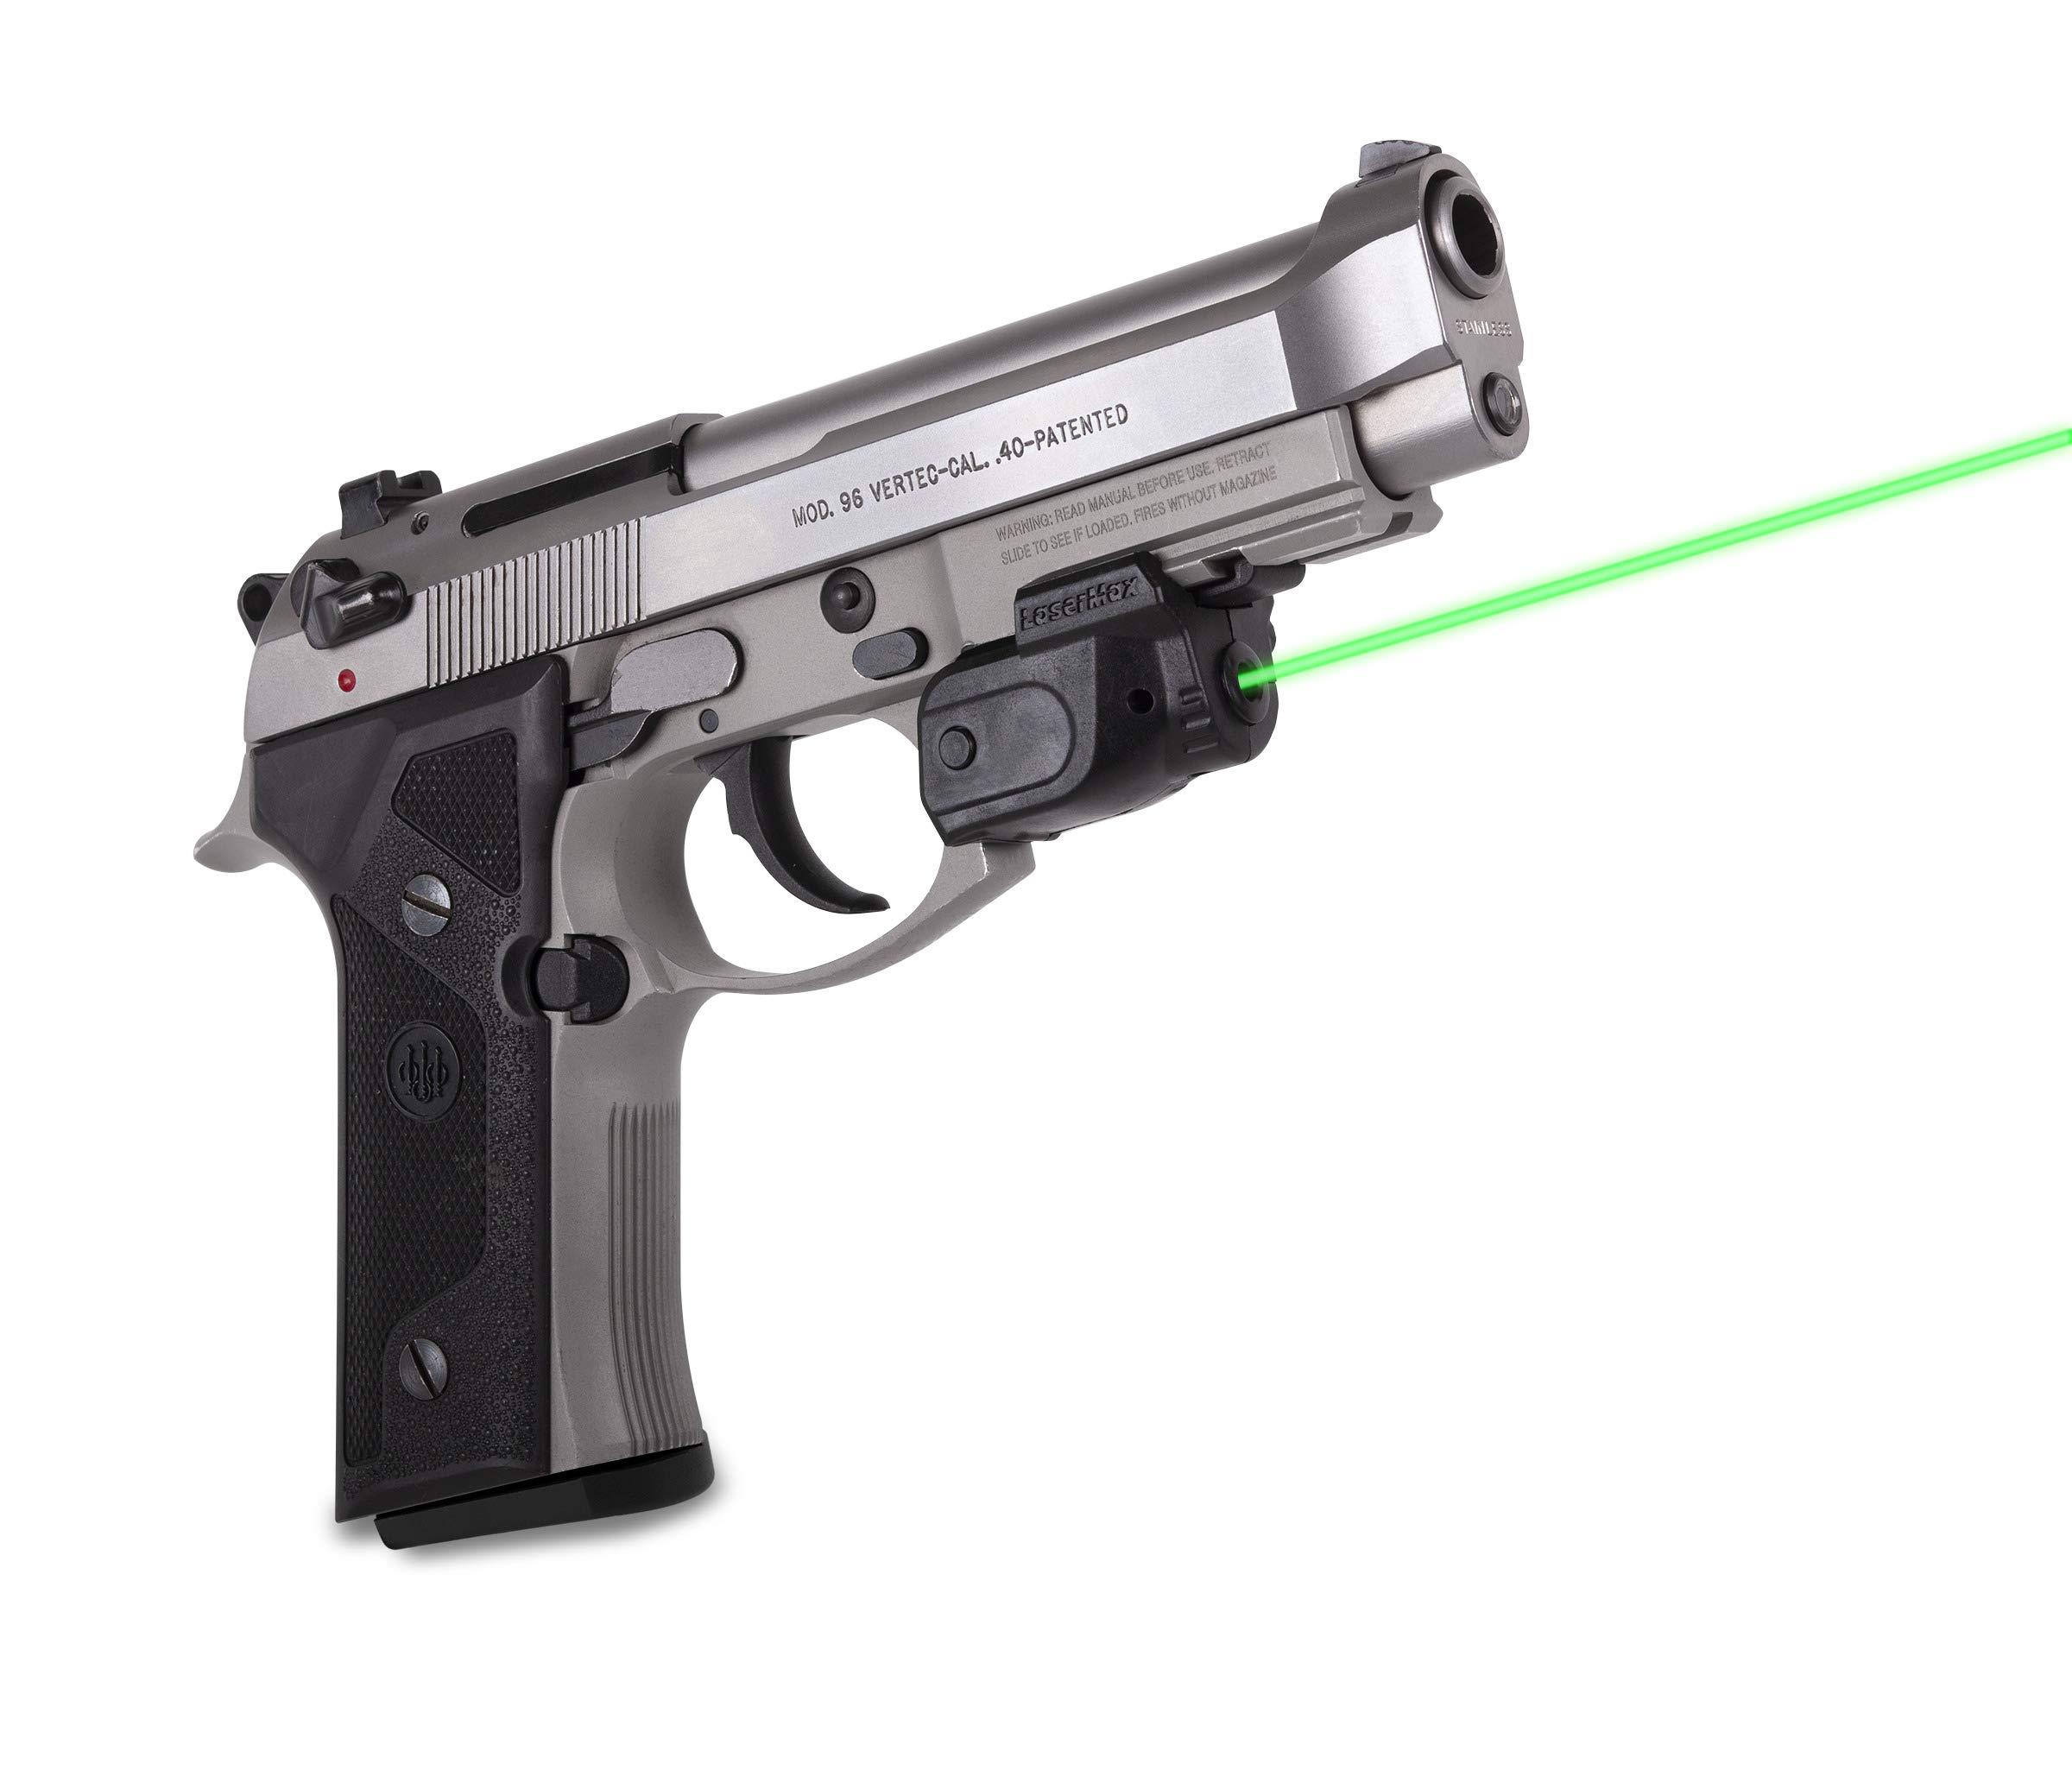 LaserMax Lightning Rail Mounted Laser (Green) GS-LTN-G With GripSense by LaserMax